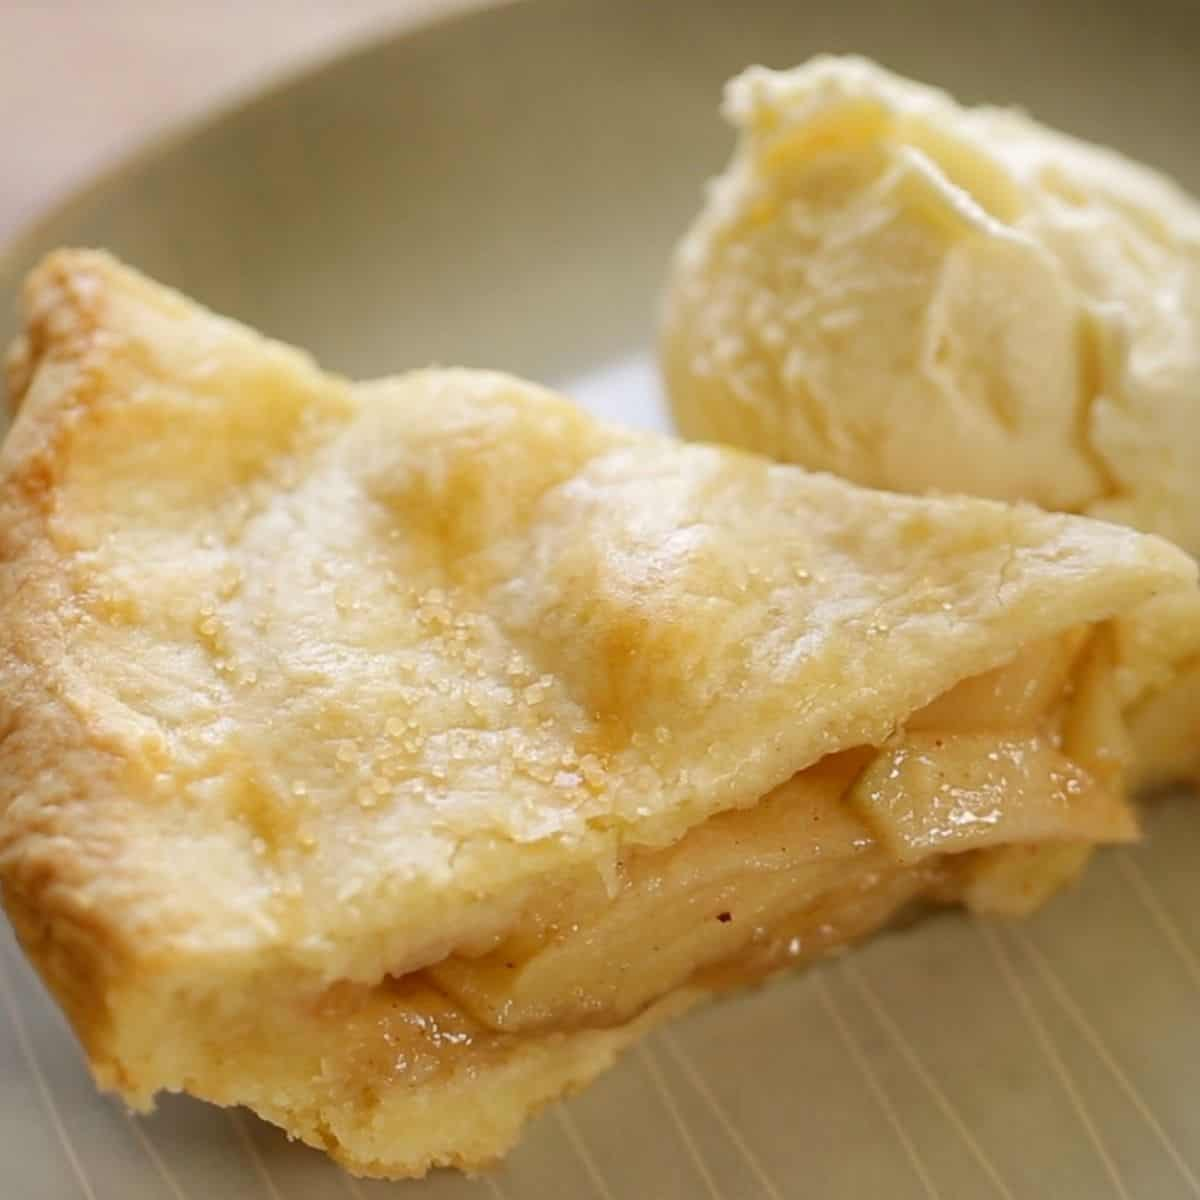 Slice of Apple Pie with a scoop of Ice Cream